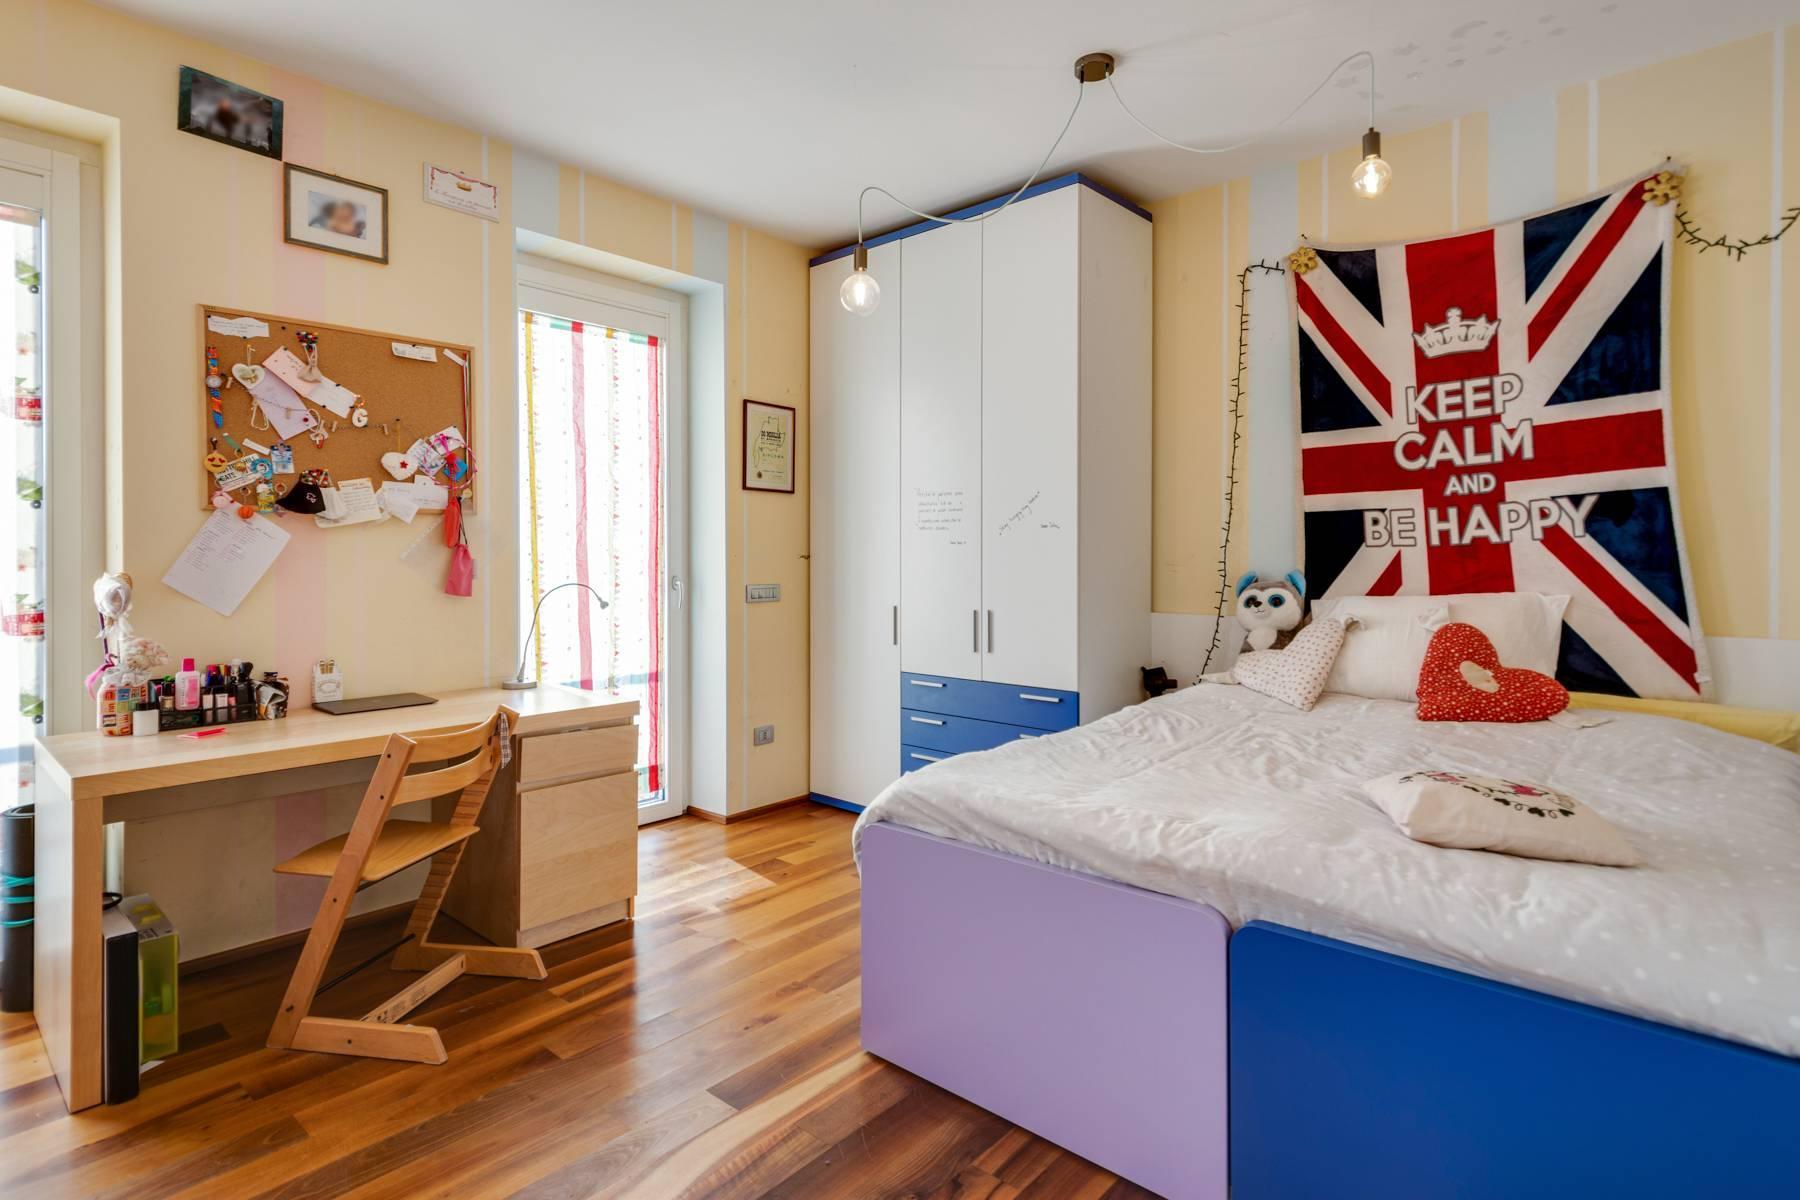 International Style villa in the heart of Franciacorta - 15